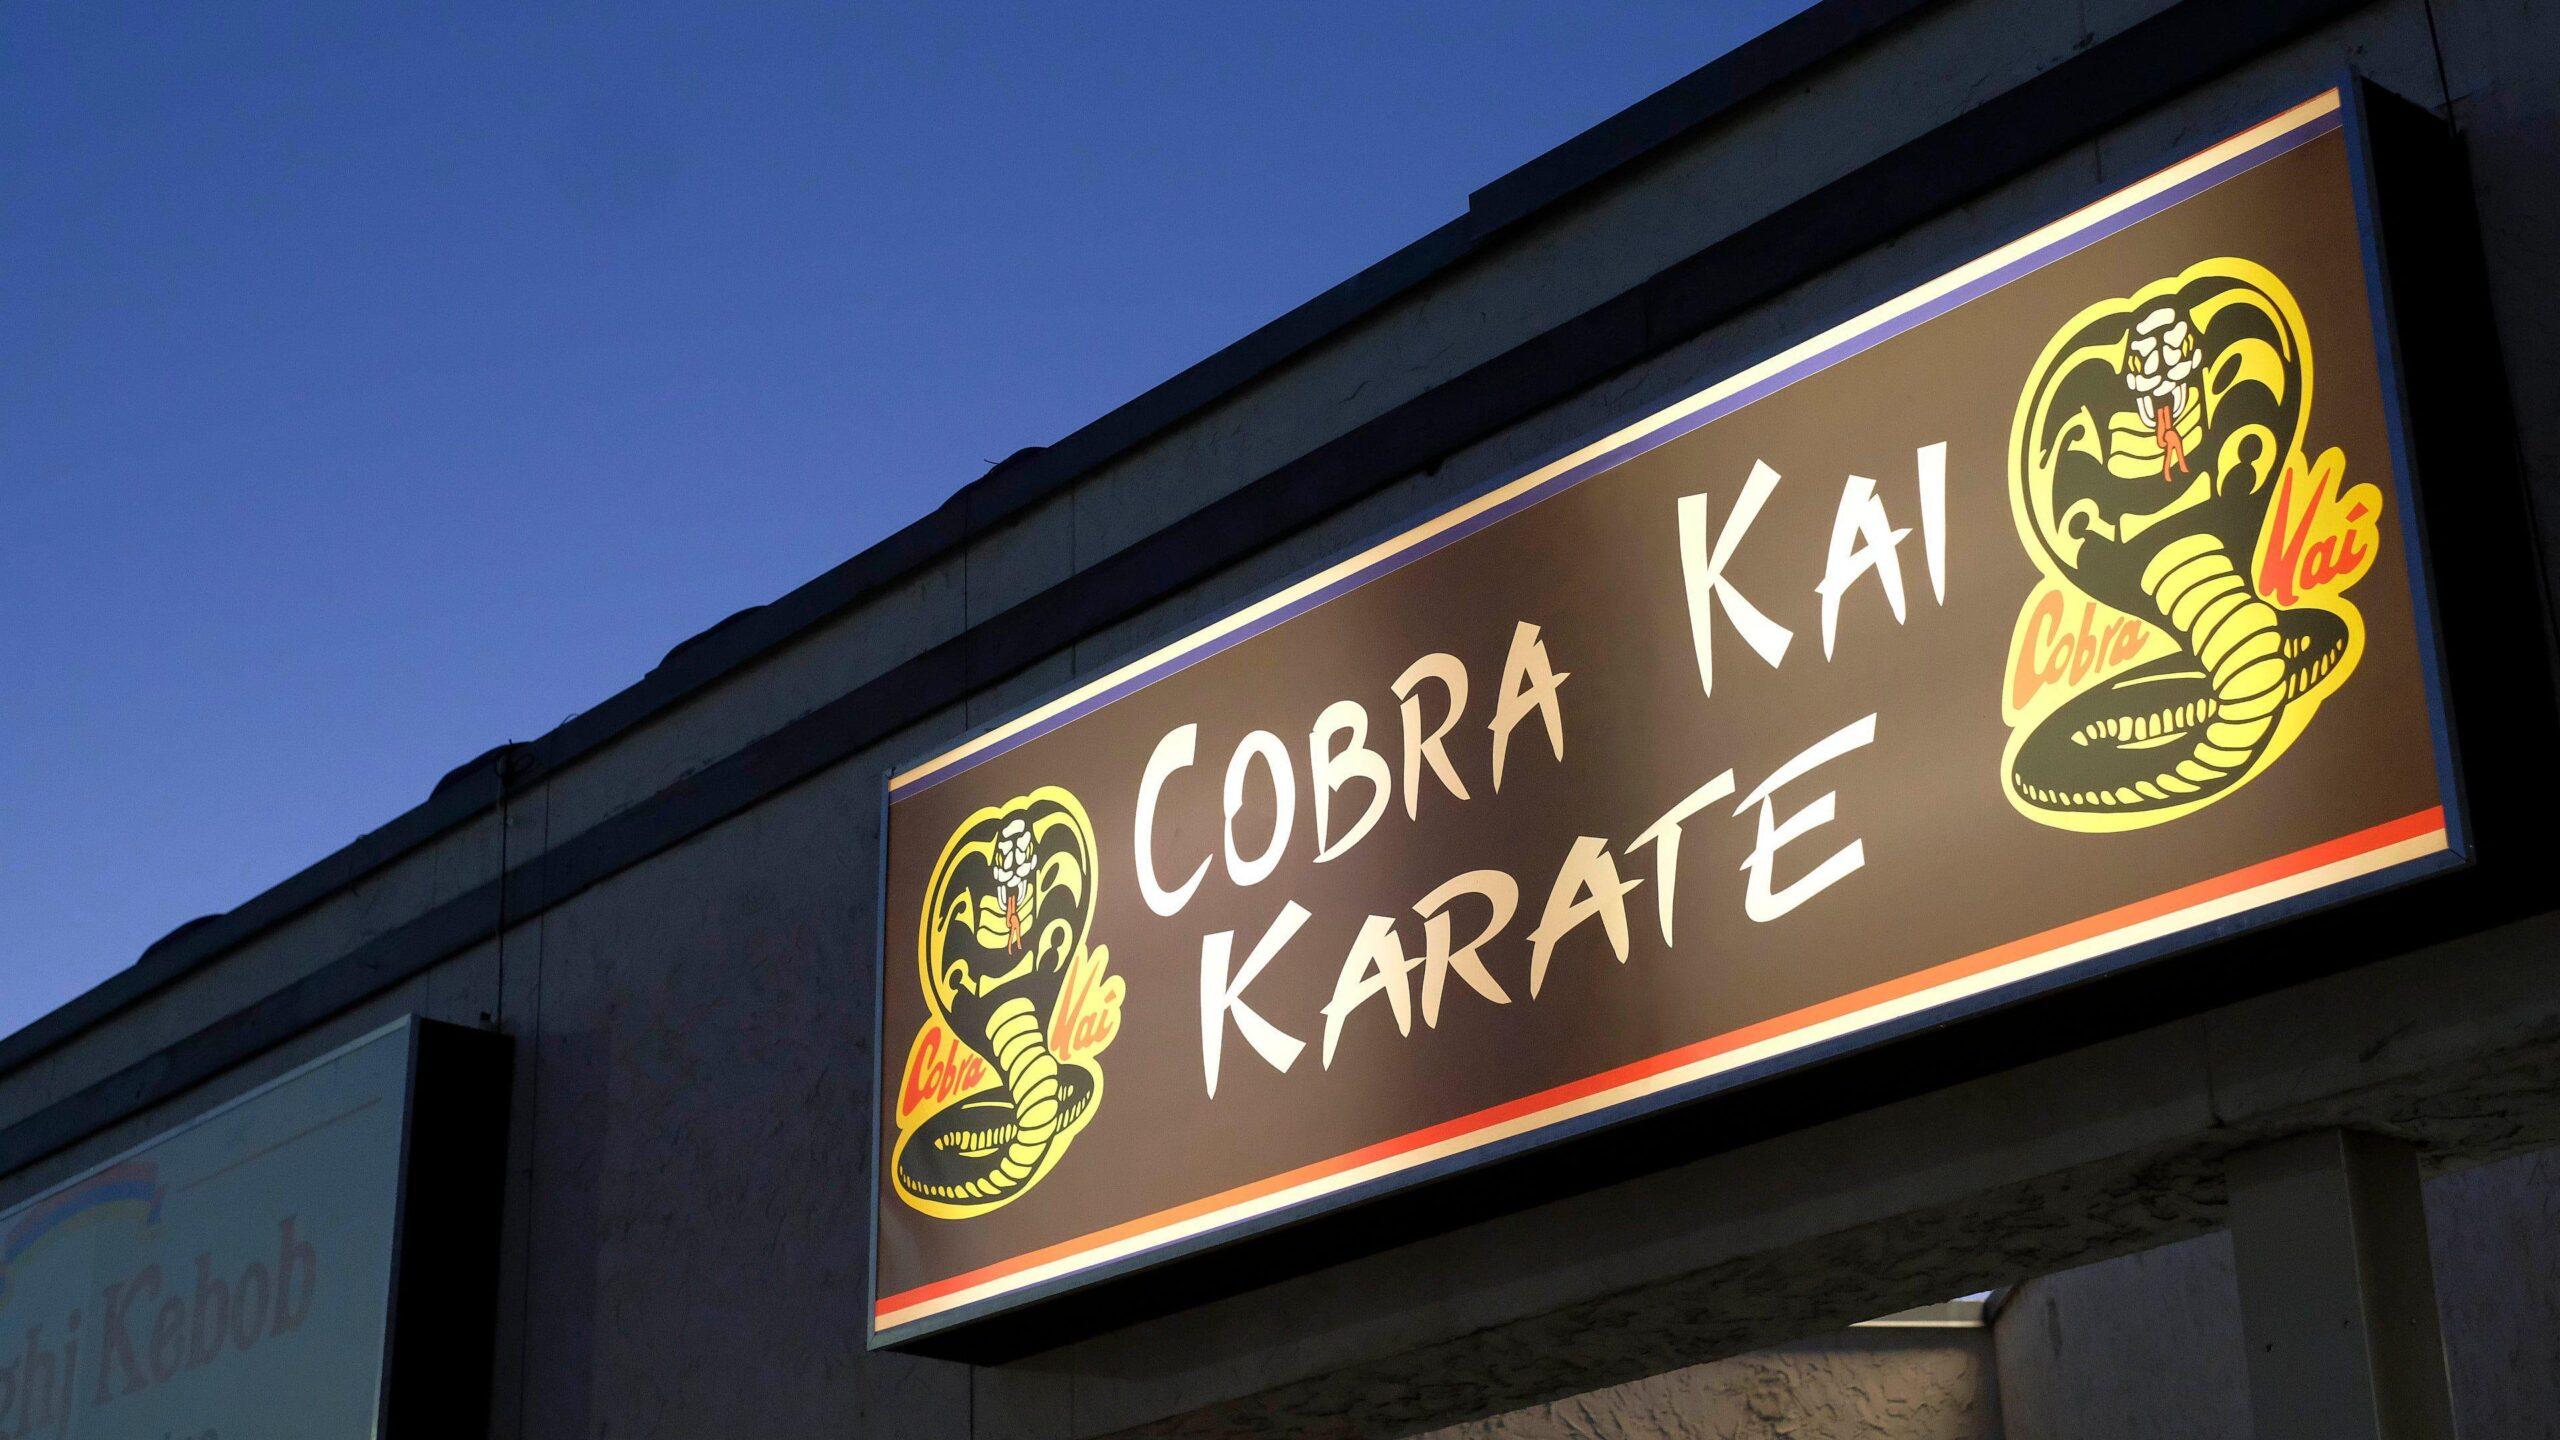 cobra kai wallpaper hd